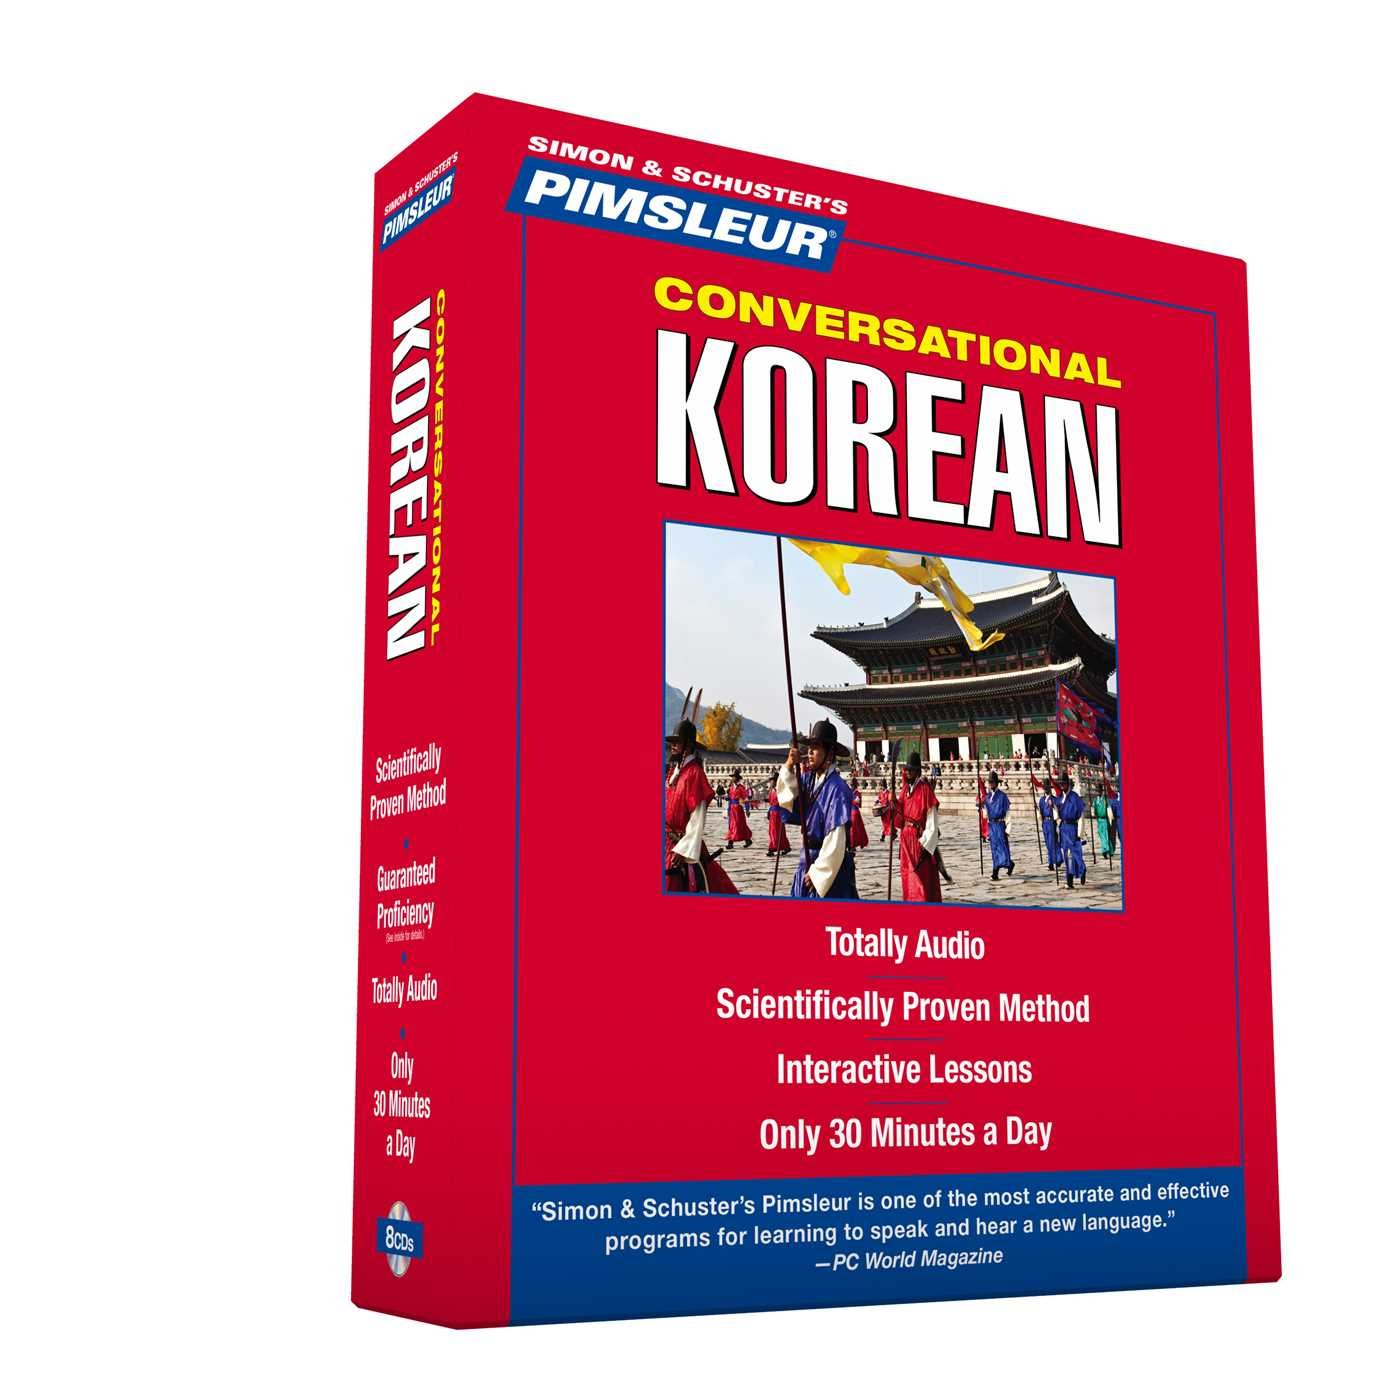 Pimsleur Korean Conversational Course Understand product image